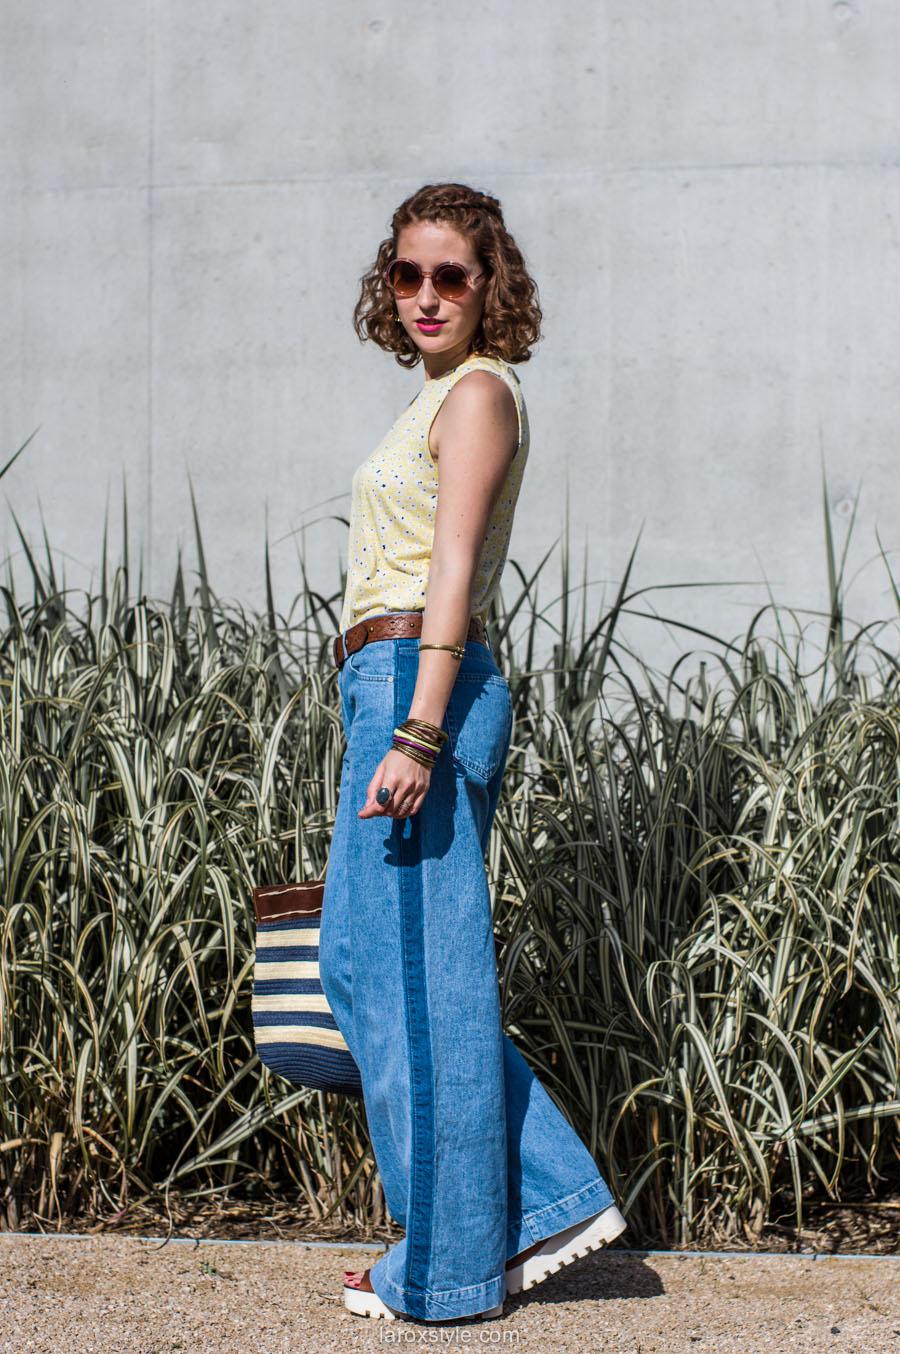 laroxstyle - blog mode lyon - look 70s - pantalon patte d elephant (9 sur 44)